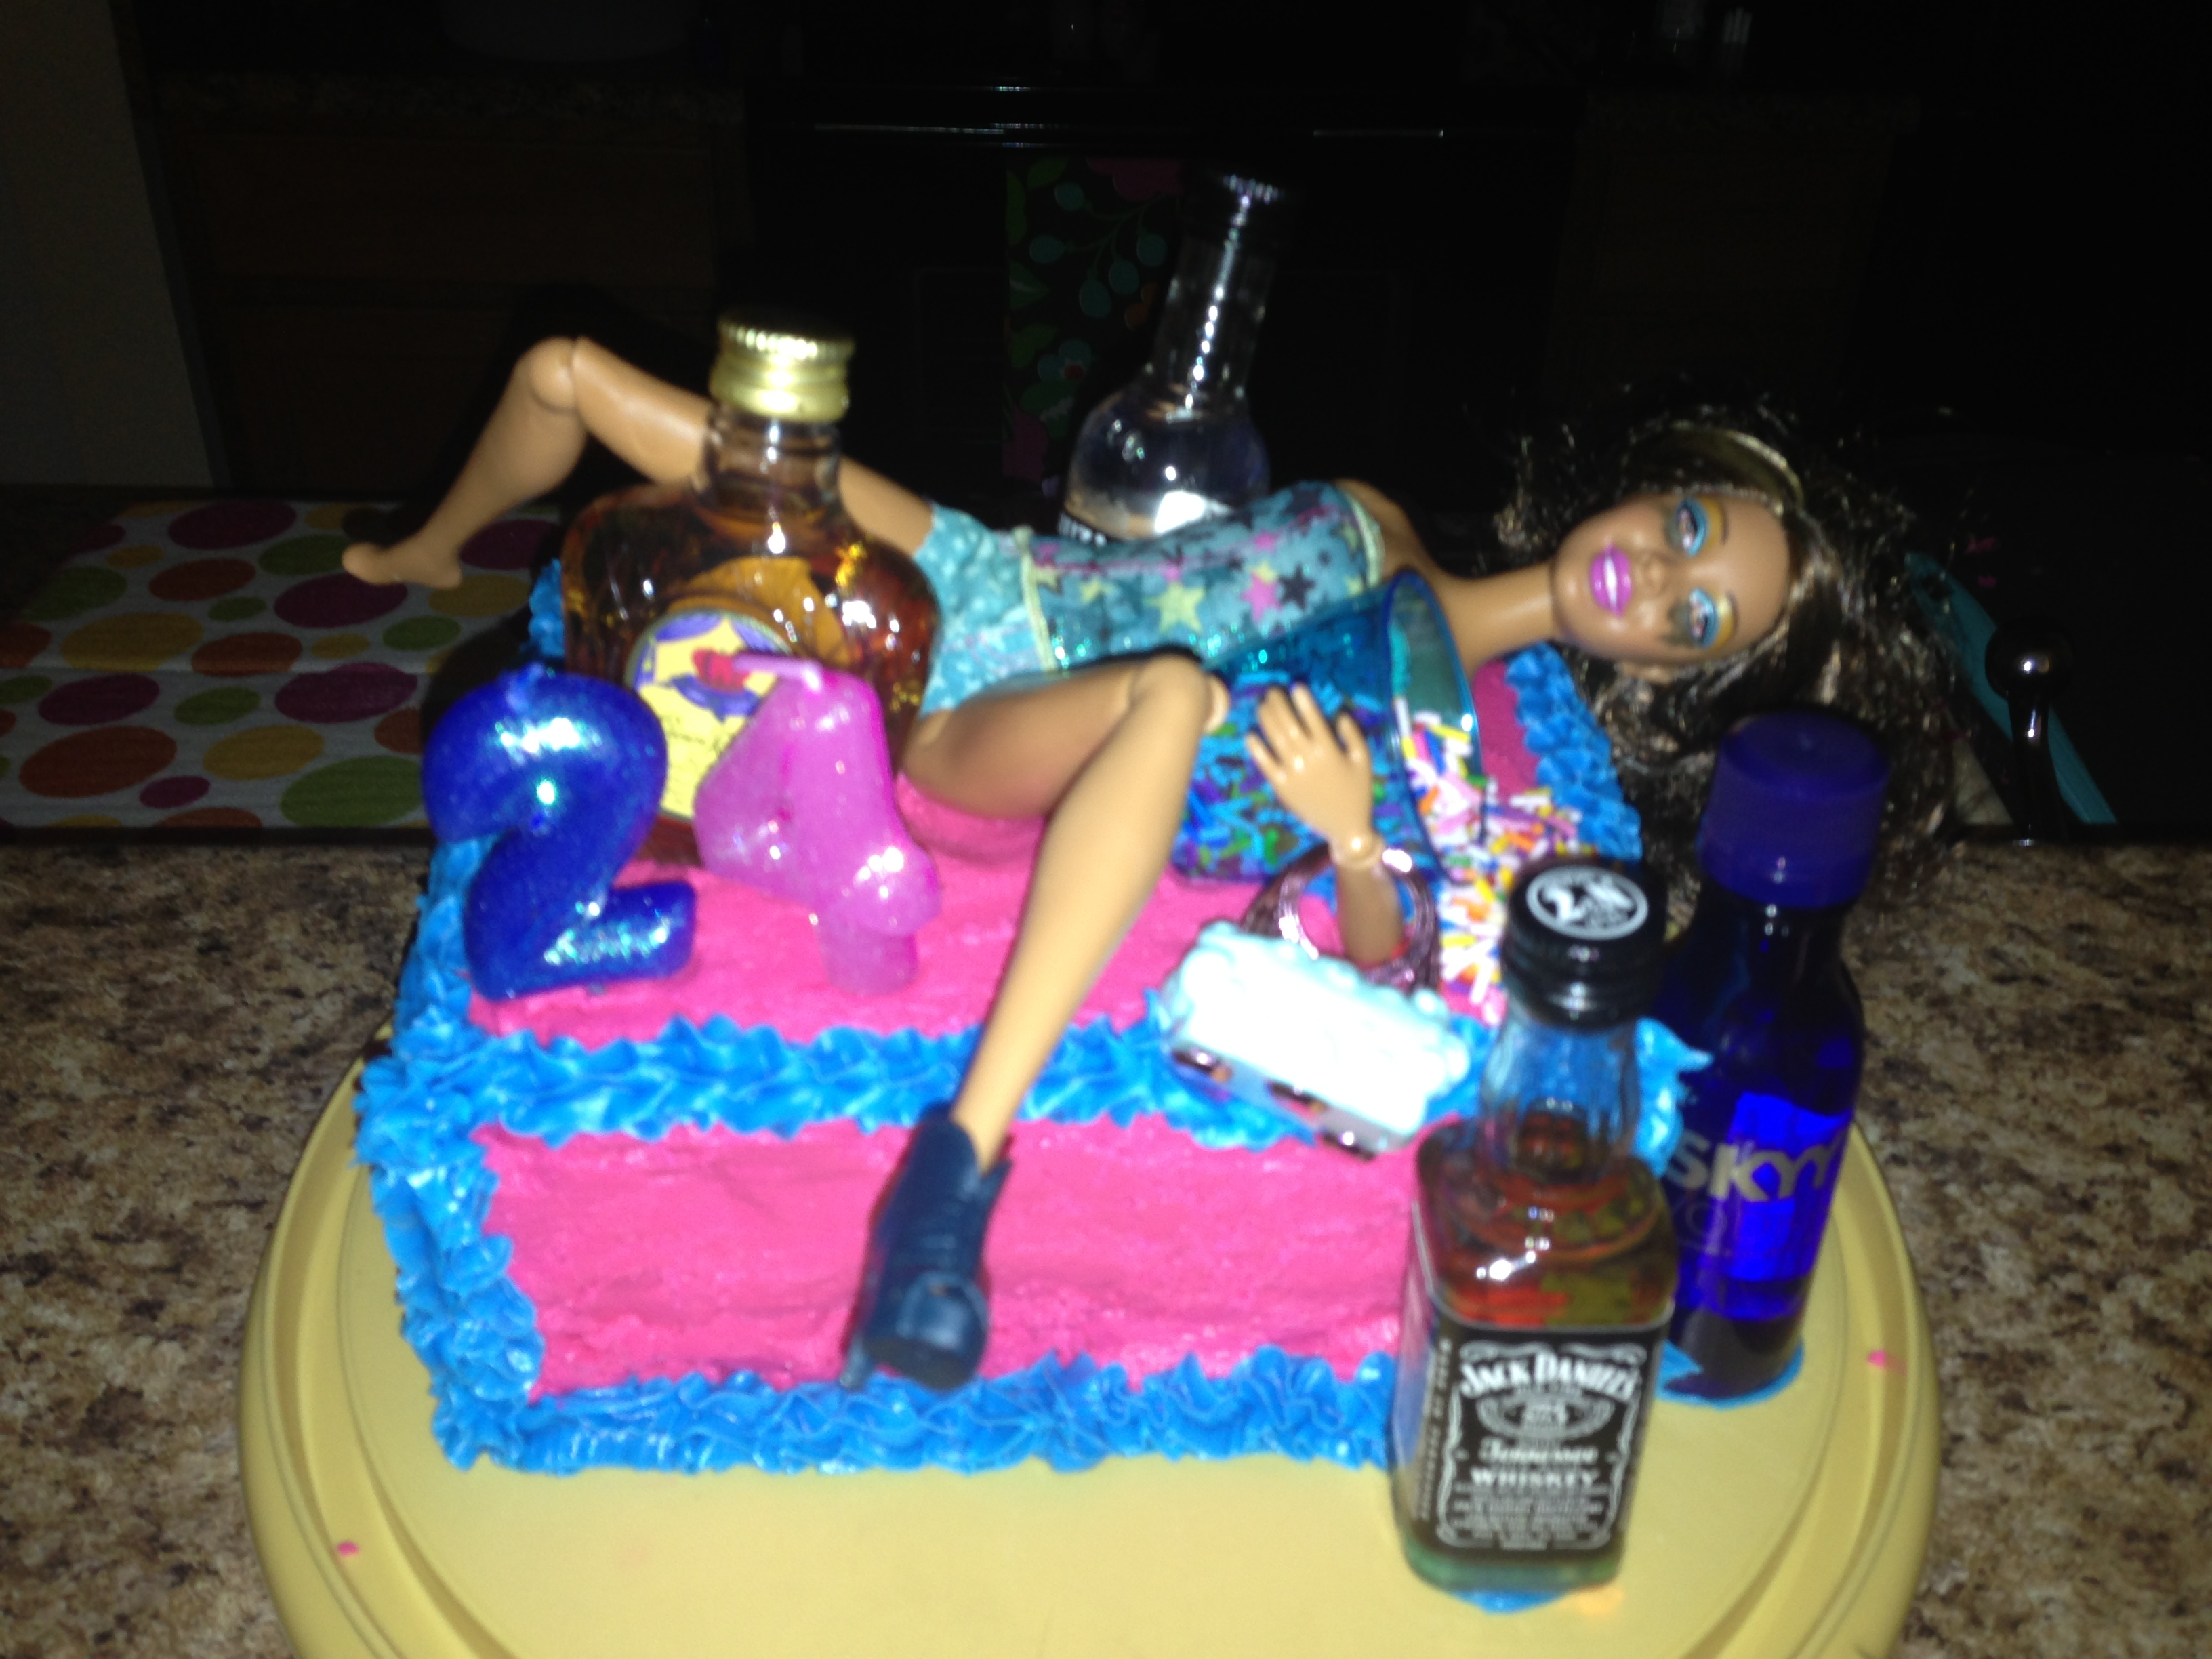 Stupendous 10 Funny Drunk Birthday Cakes For Men Photo Drunk Barbie 21St Funny Birthday Cards Online Kookostrdamsfinfo